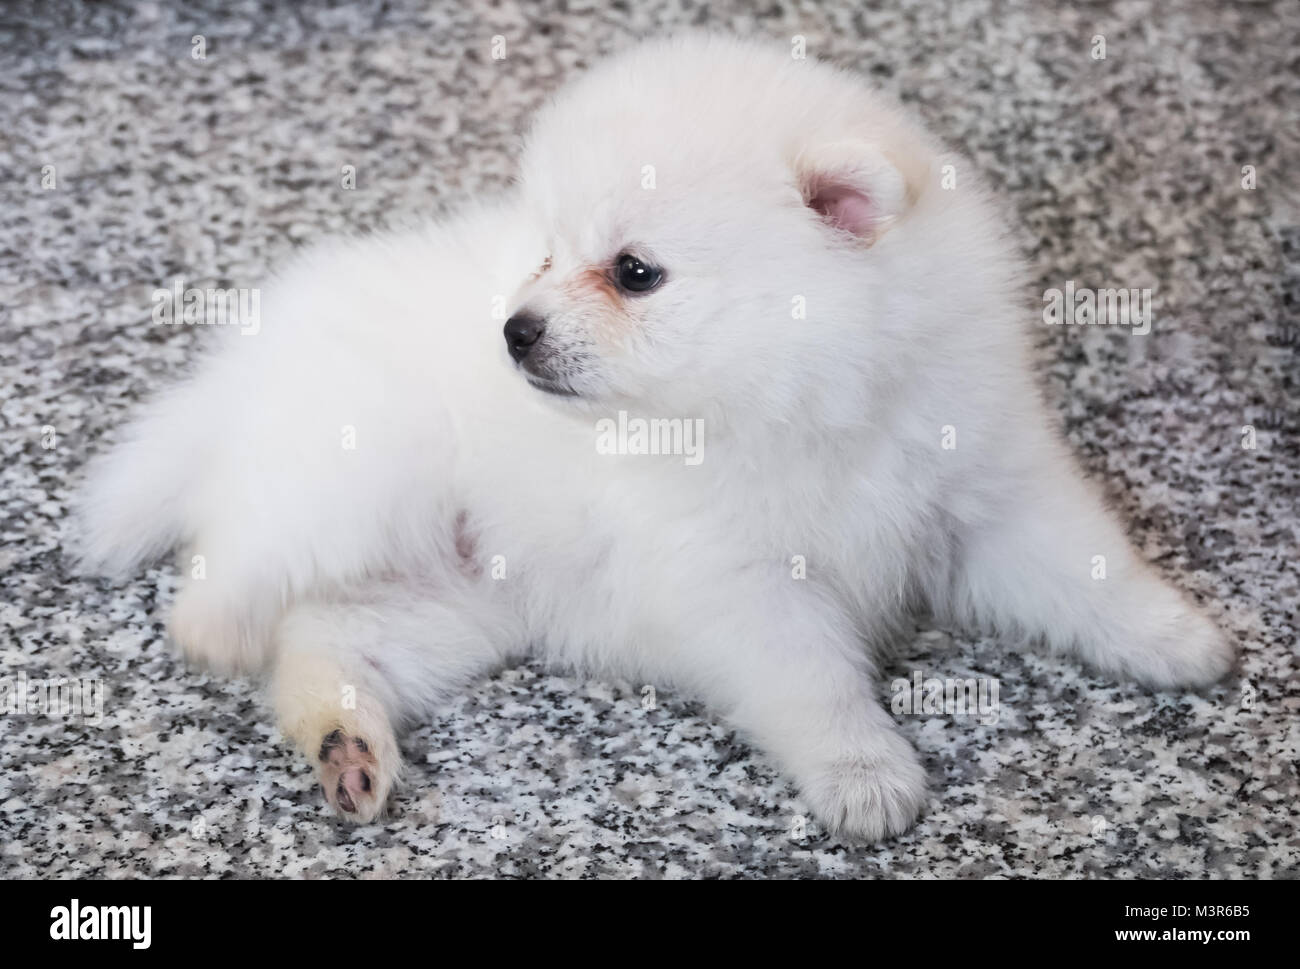 Cute White Pomeranian Puppy On Granite Background Stock Photo